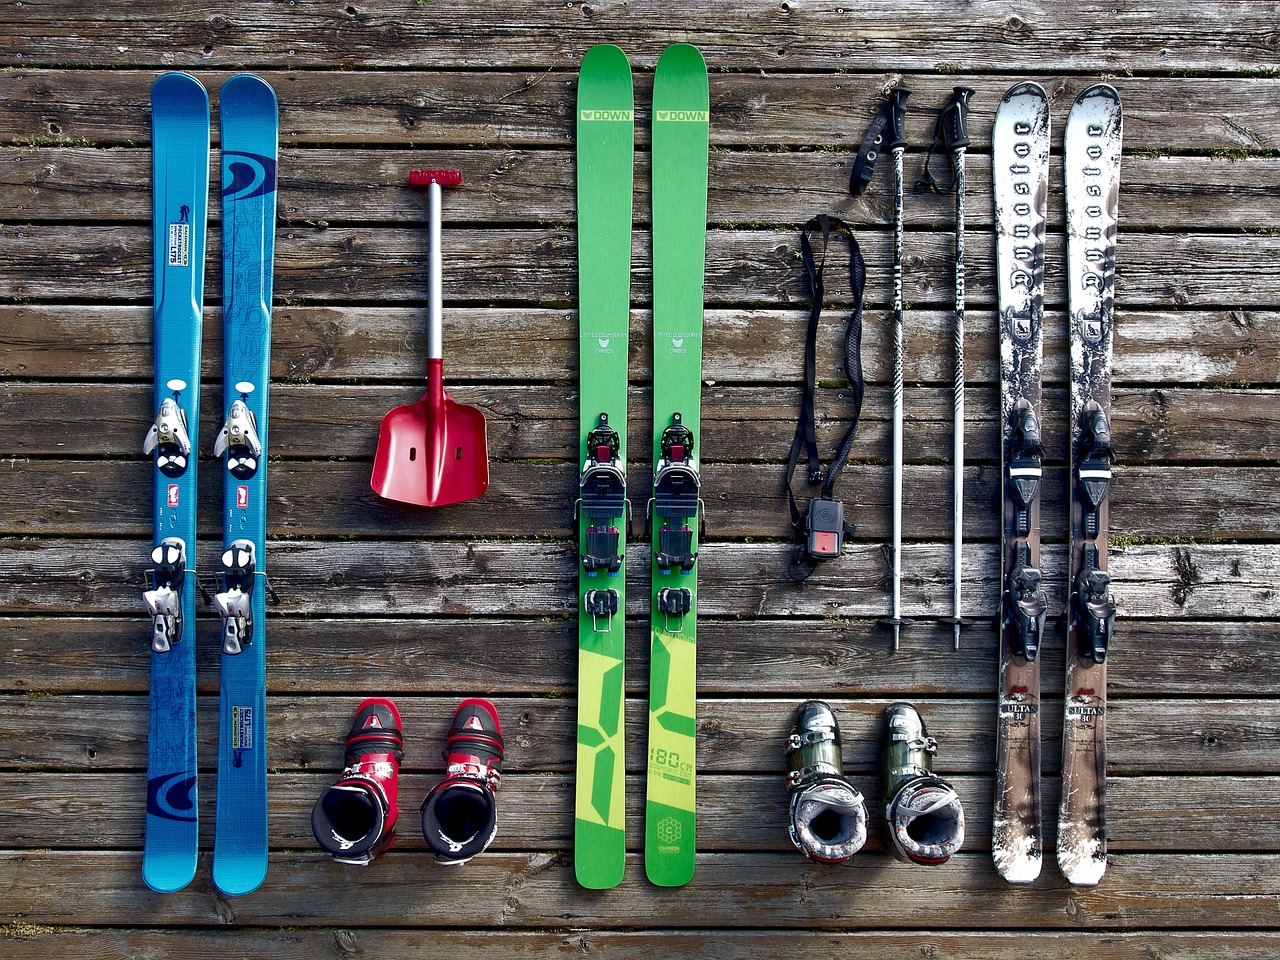 Ski equipment in storage